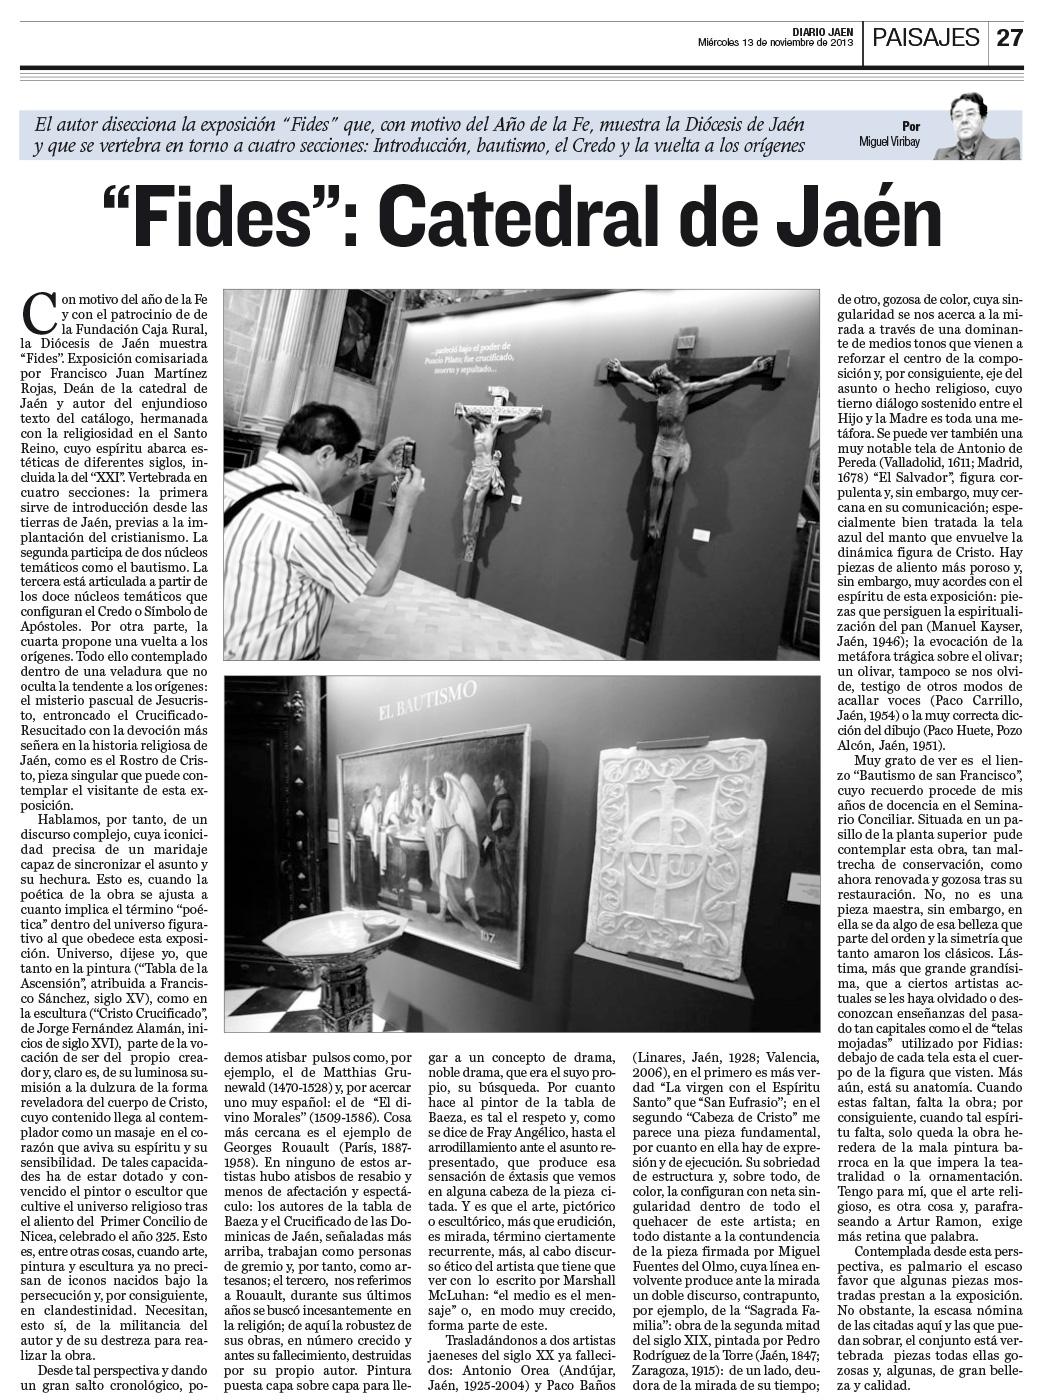 «Fides»: Catedral de Jaén (Diario de Jaén)